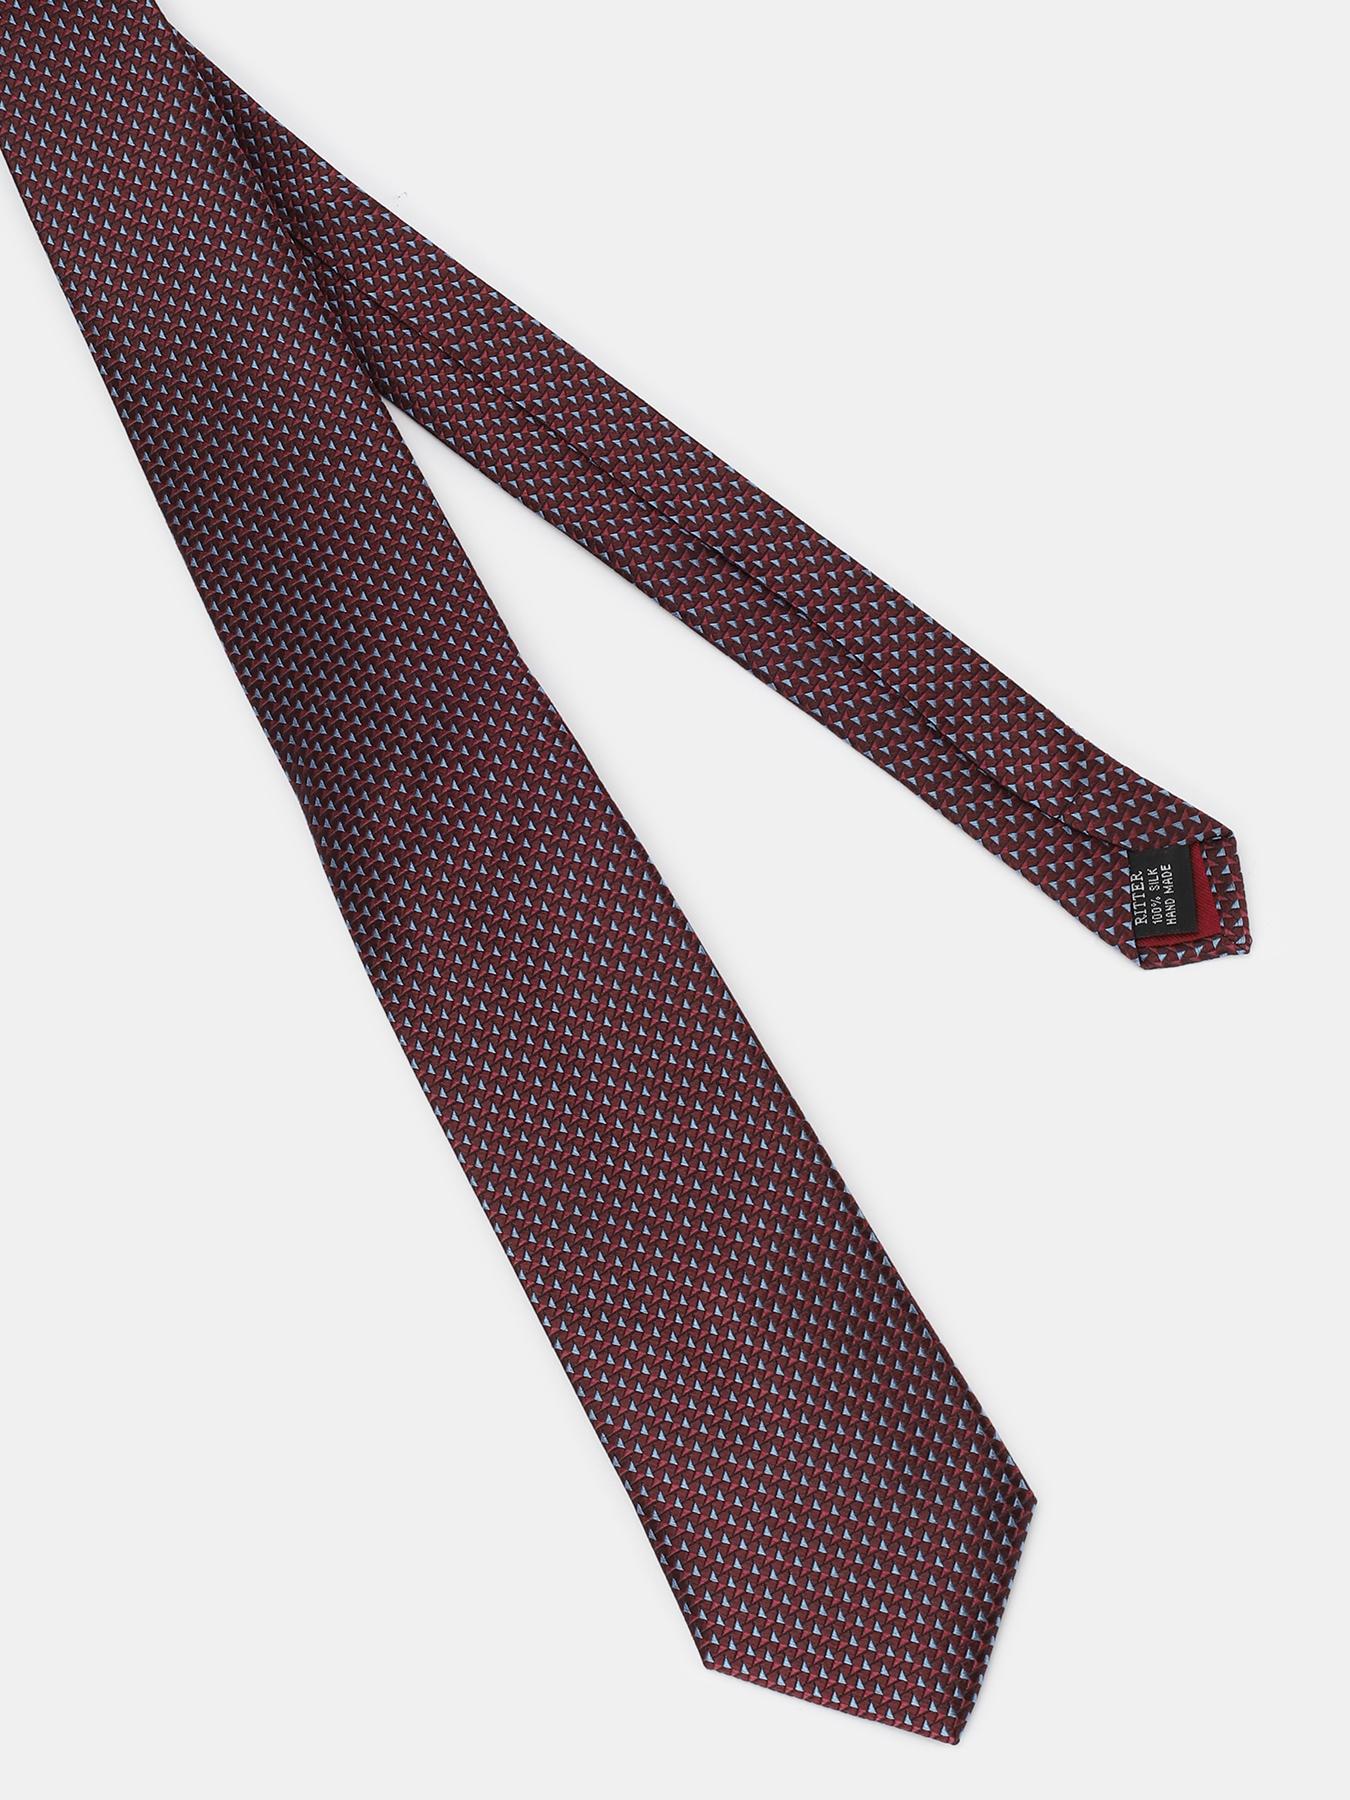 Ritter Шелковый галстук 357936-185 Фото 3